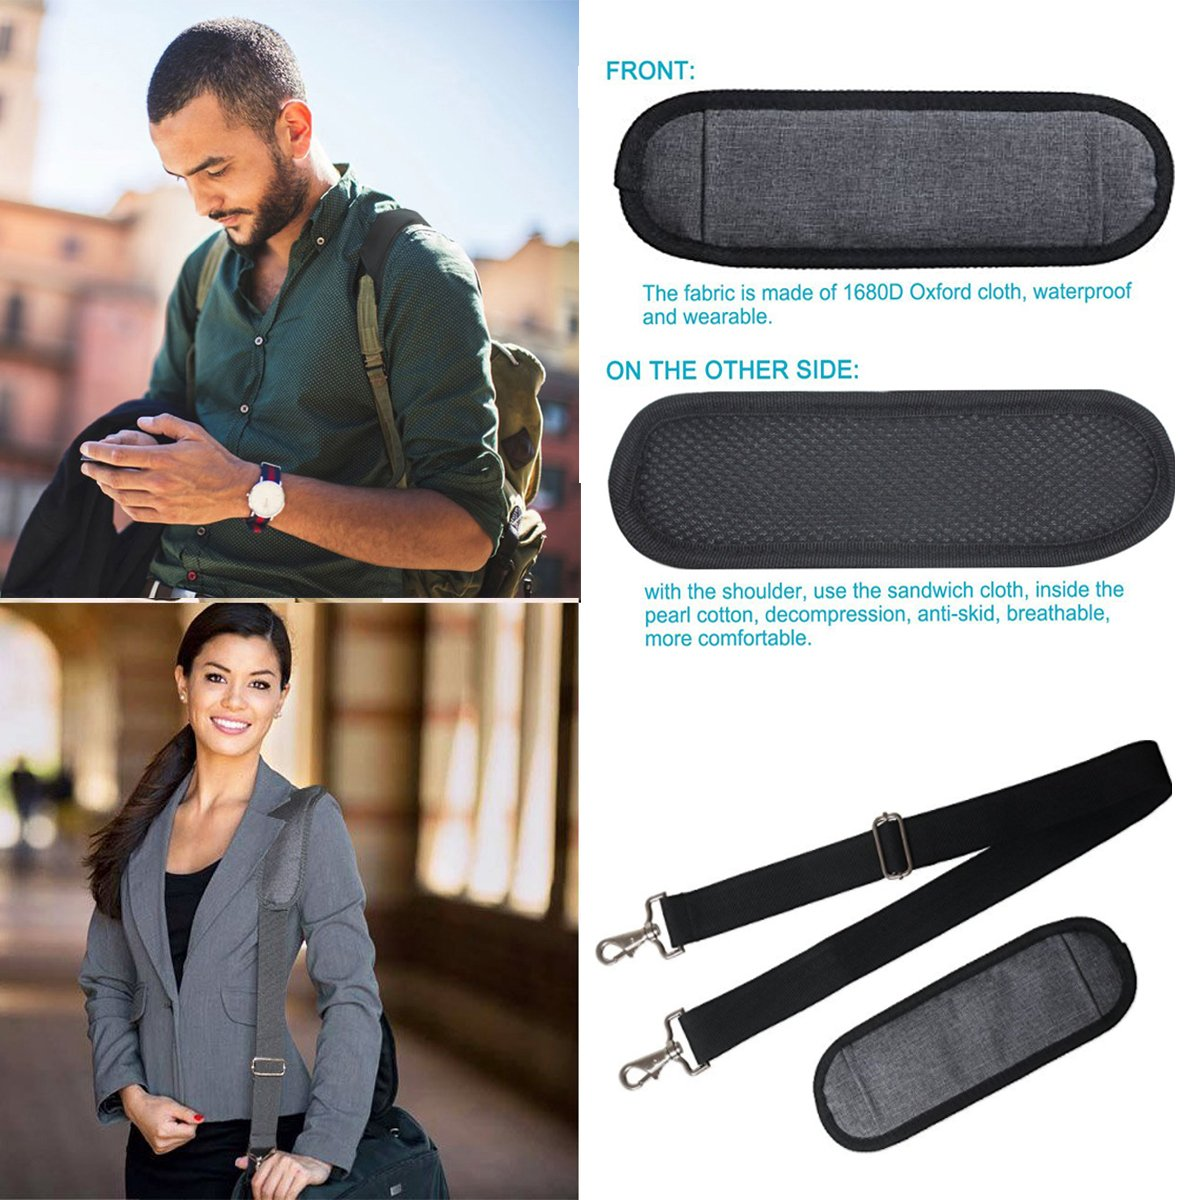 JAKAGO 150cm Universal Replacement Shoulder Straps Adjustable Bag Straps with Metal Swivel Hooks and Non-Slip Pad for Duffel Bag Laptop Briefcase Violin Bag Camera Travel Bag (Grey) by JAKAGO (Image #2)